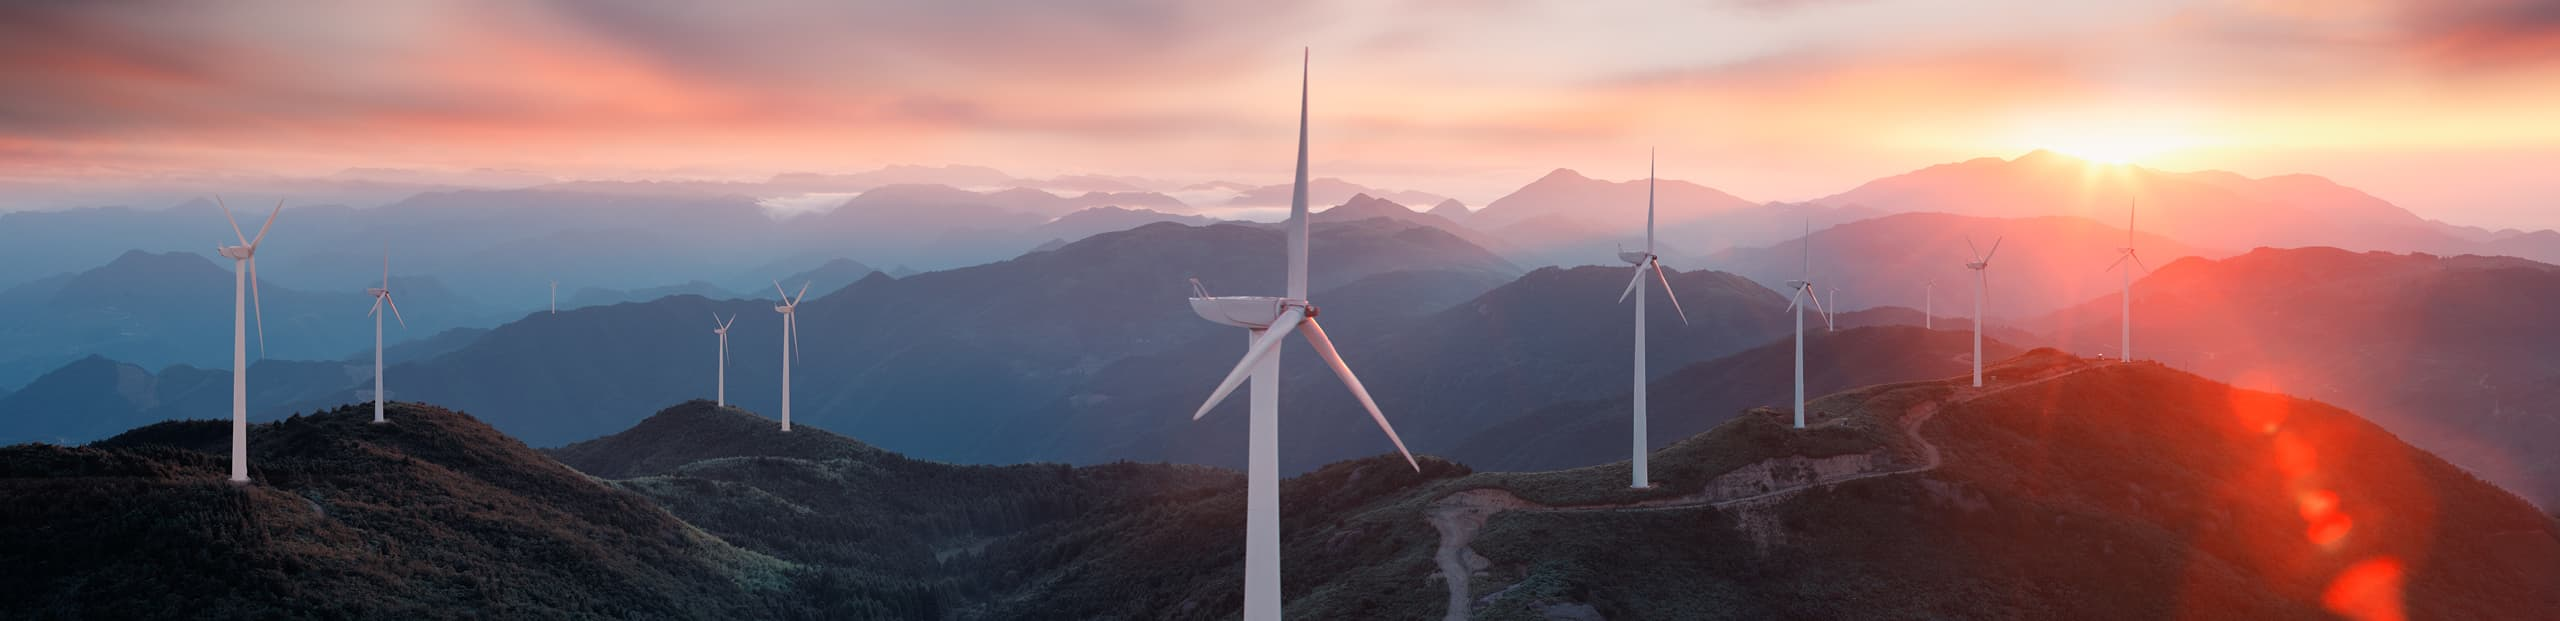 Header_EnergietechnikErneuerbareEnergien